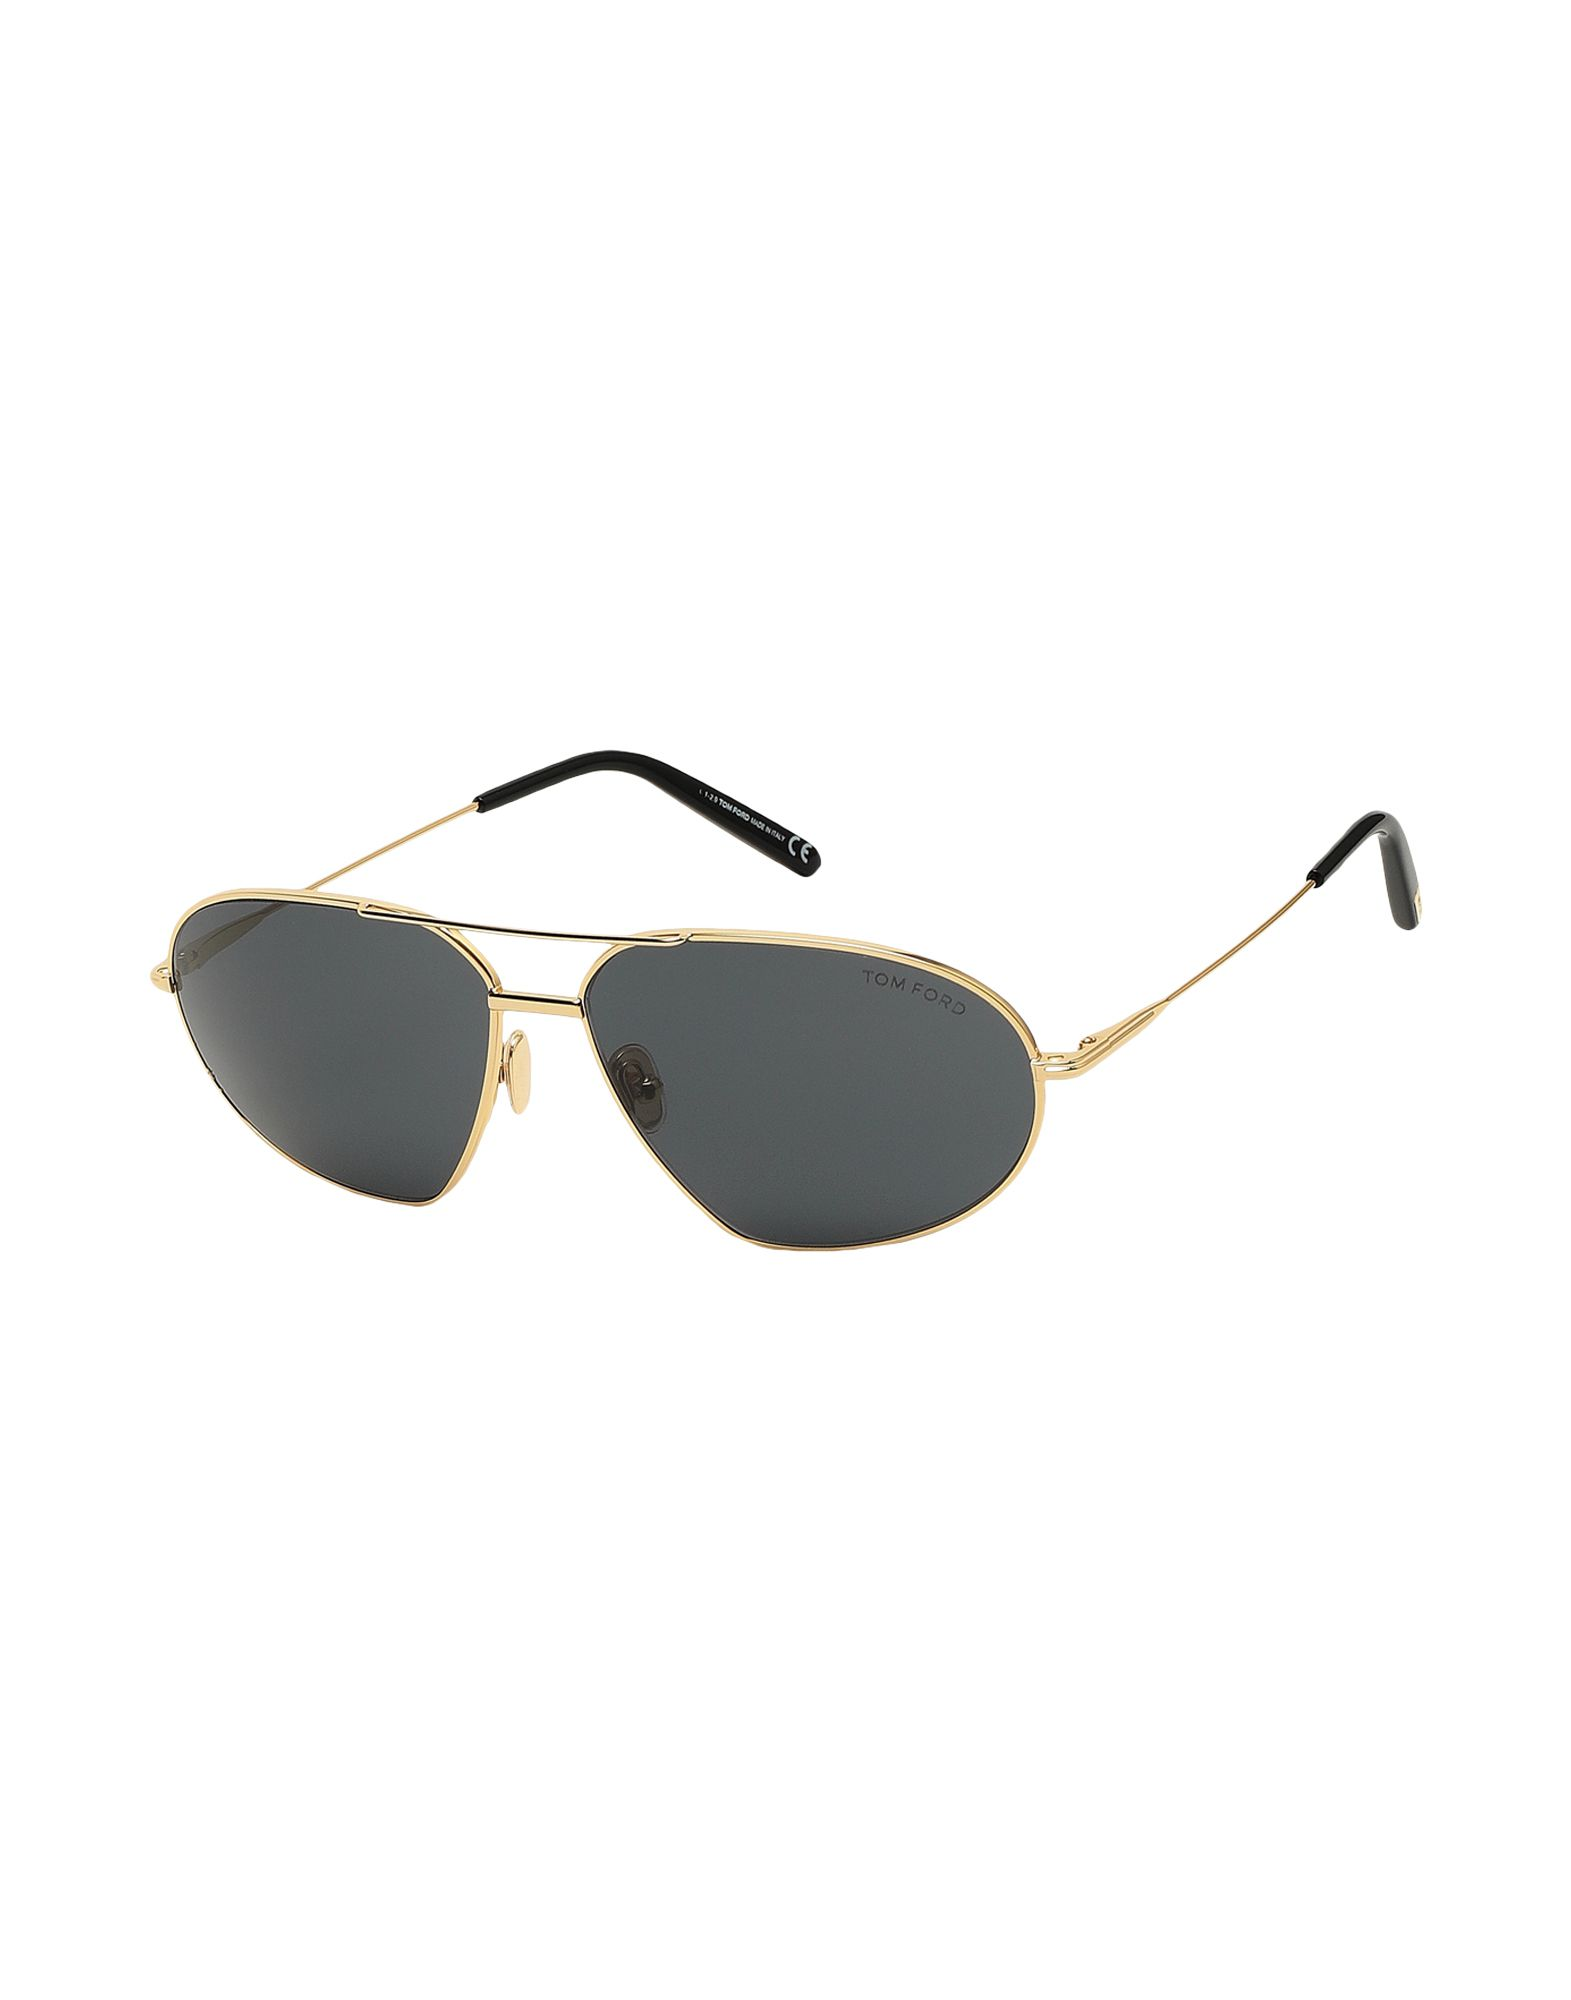 TOM FORD Sunglasses - Item 46699023